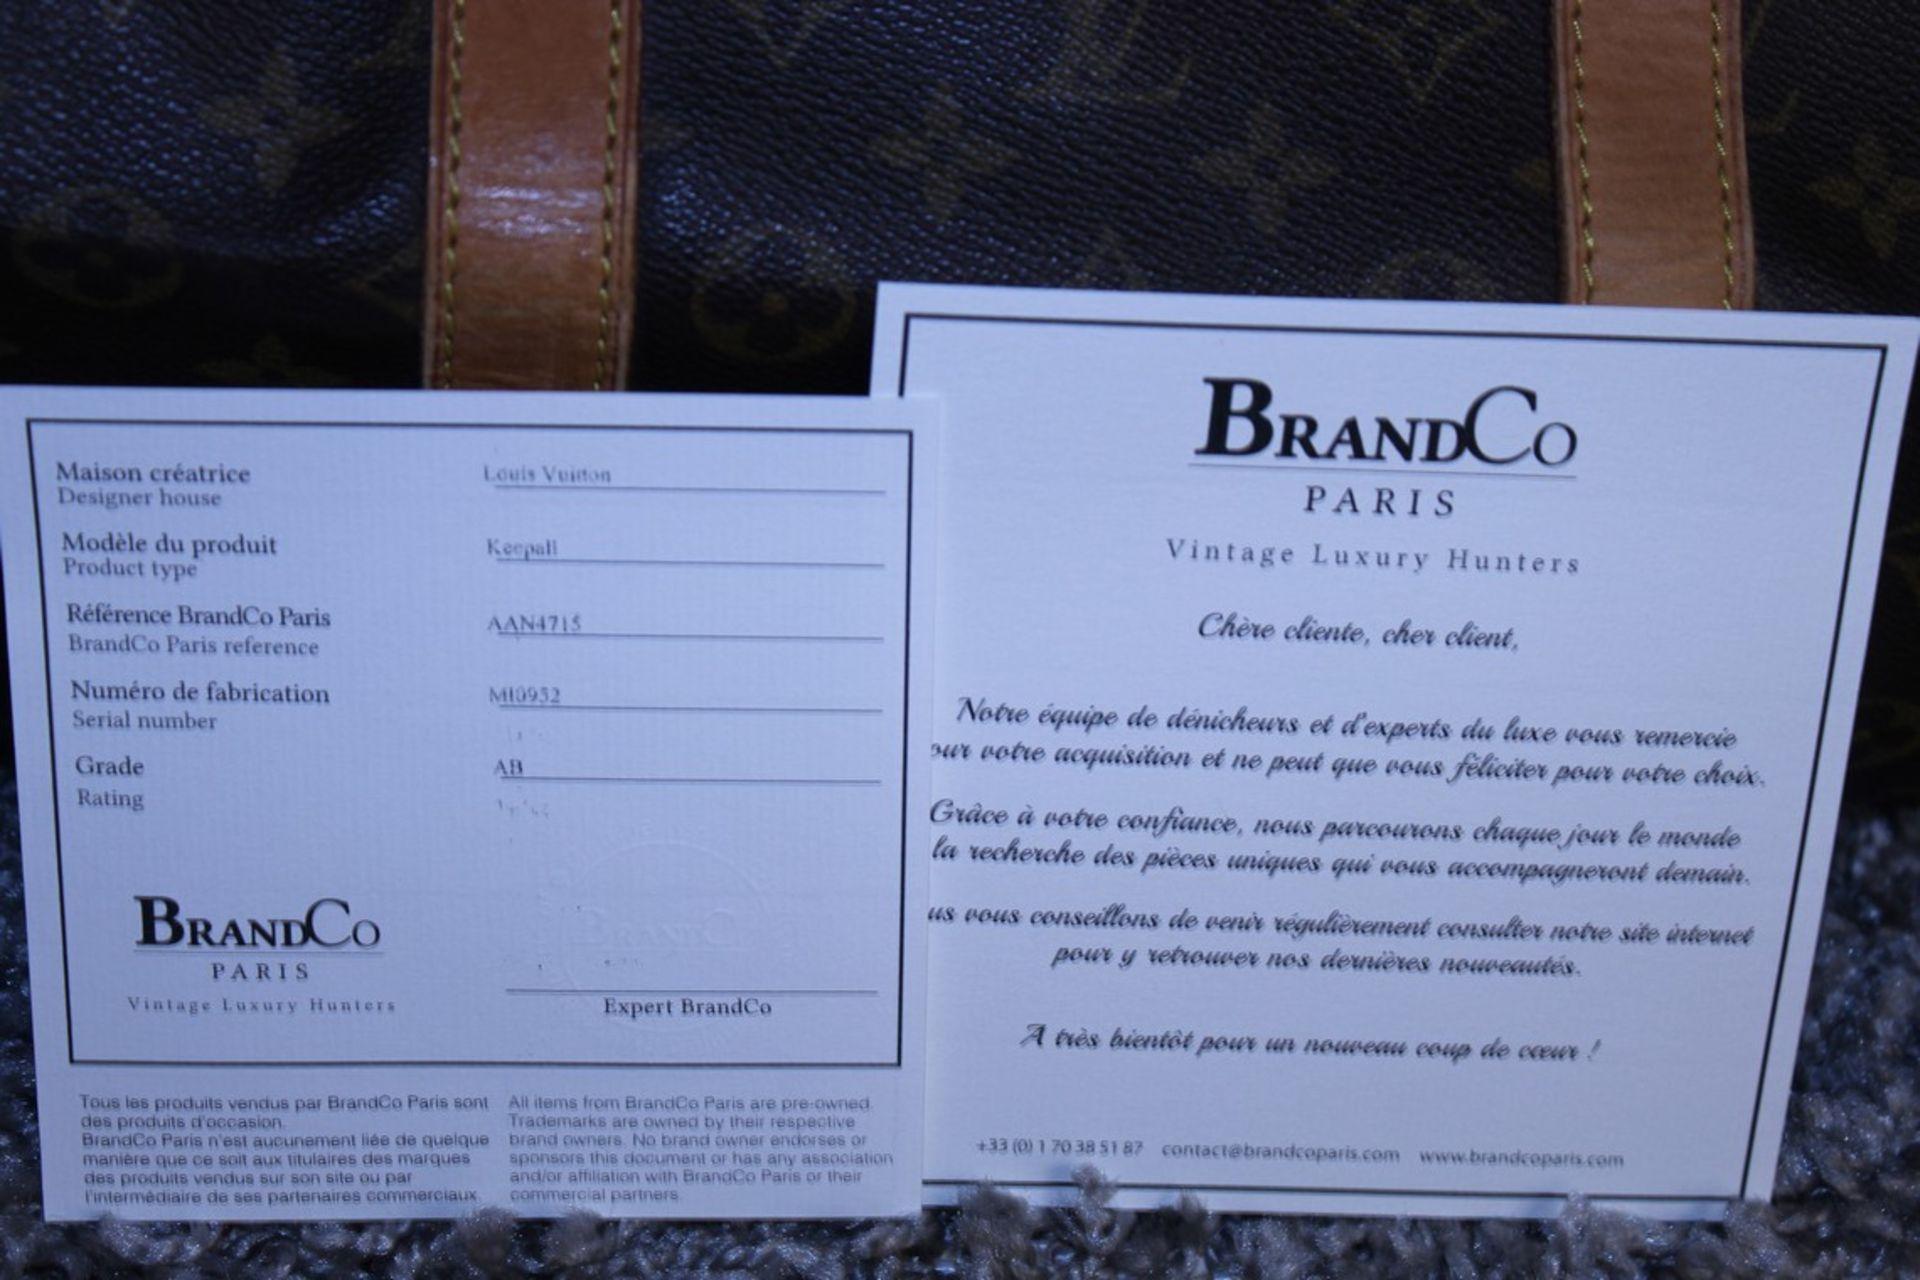 RRP £1,780 Louis Vuitton Keepall 55 Travel Bag, Brown Monogram Canvas, Vachetta Handles, 55X28X25Cm, - Image 5 of 5